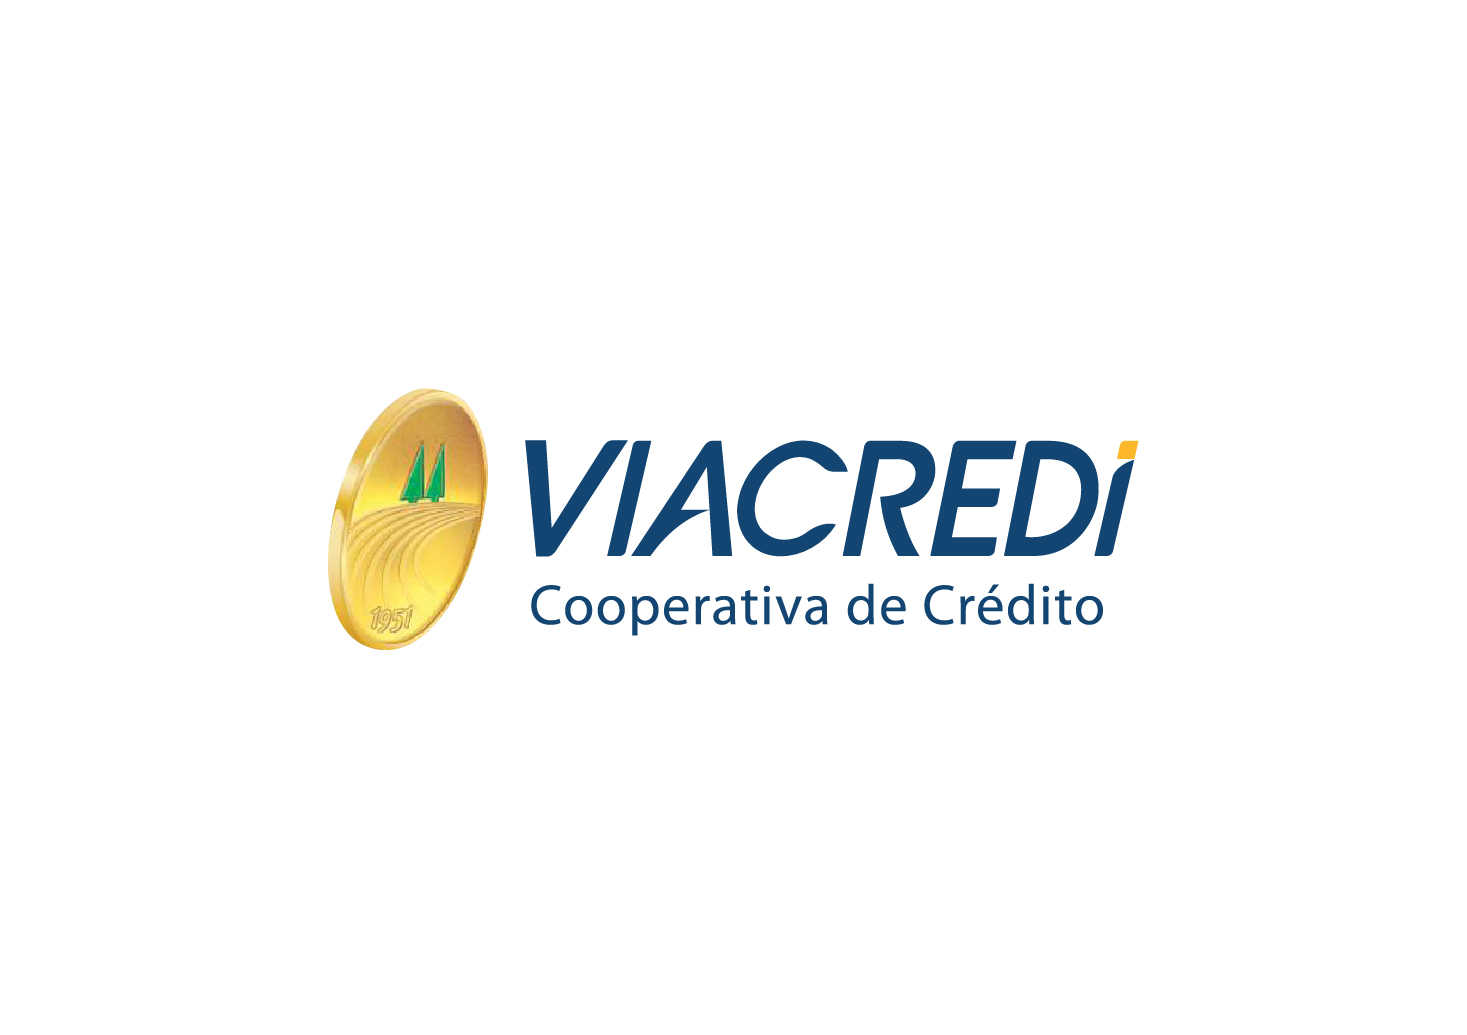 Logotipo AABC Viacredi Cooperativa de Crédito